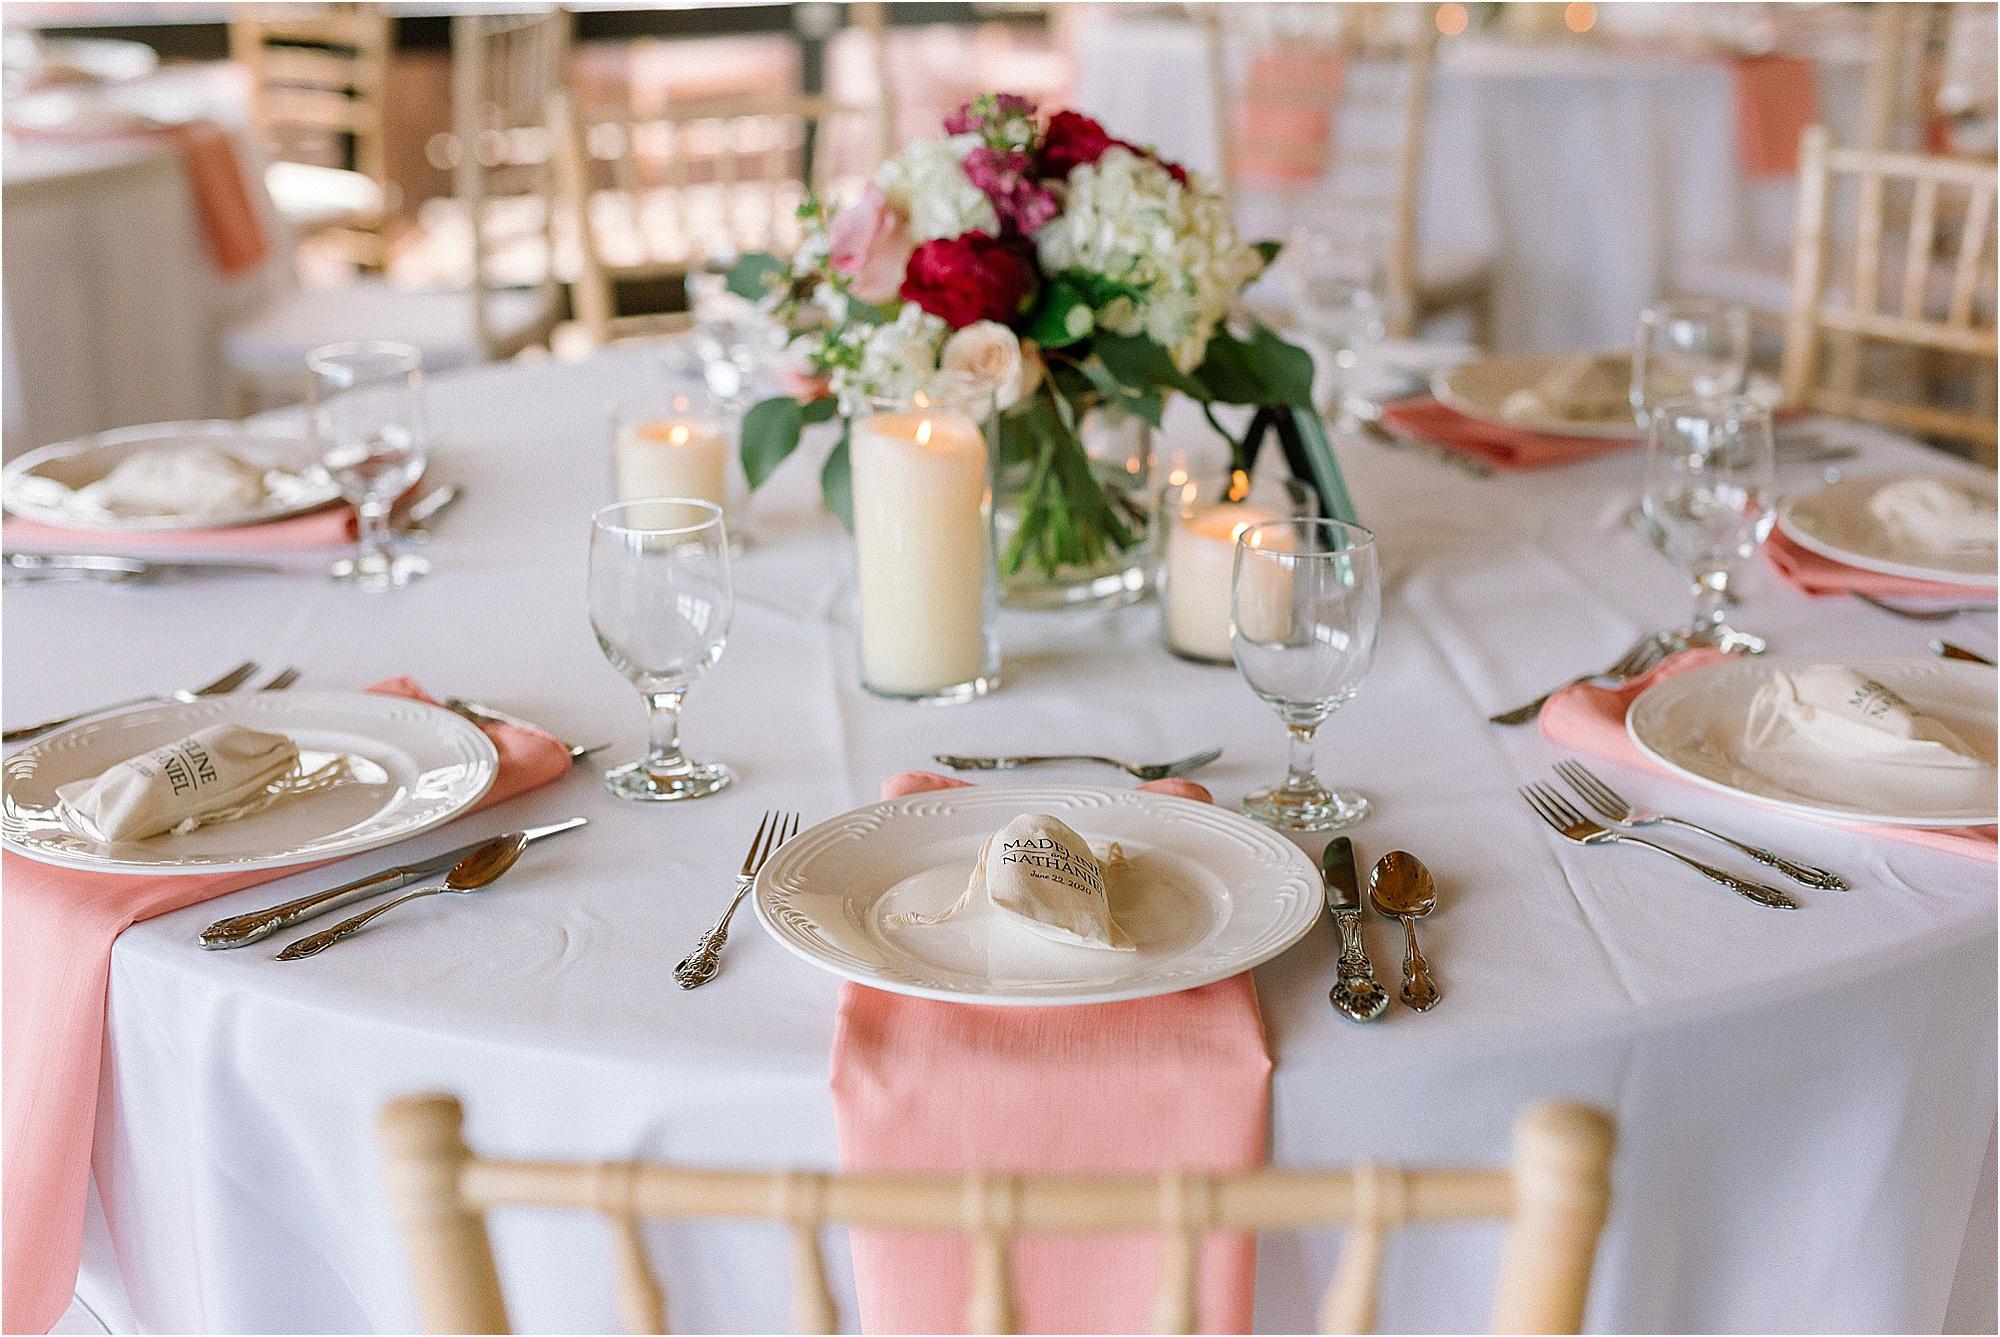 pink wedding table decor at wedding reception at mountaintop affair